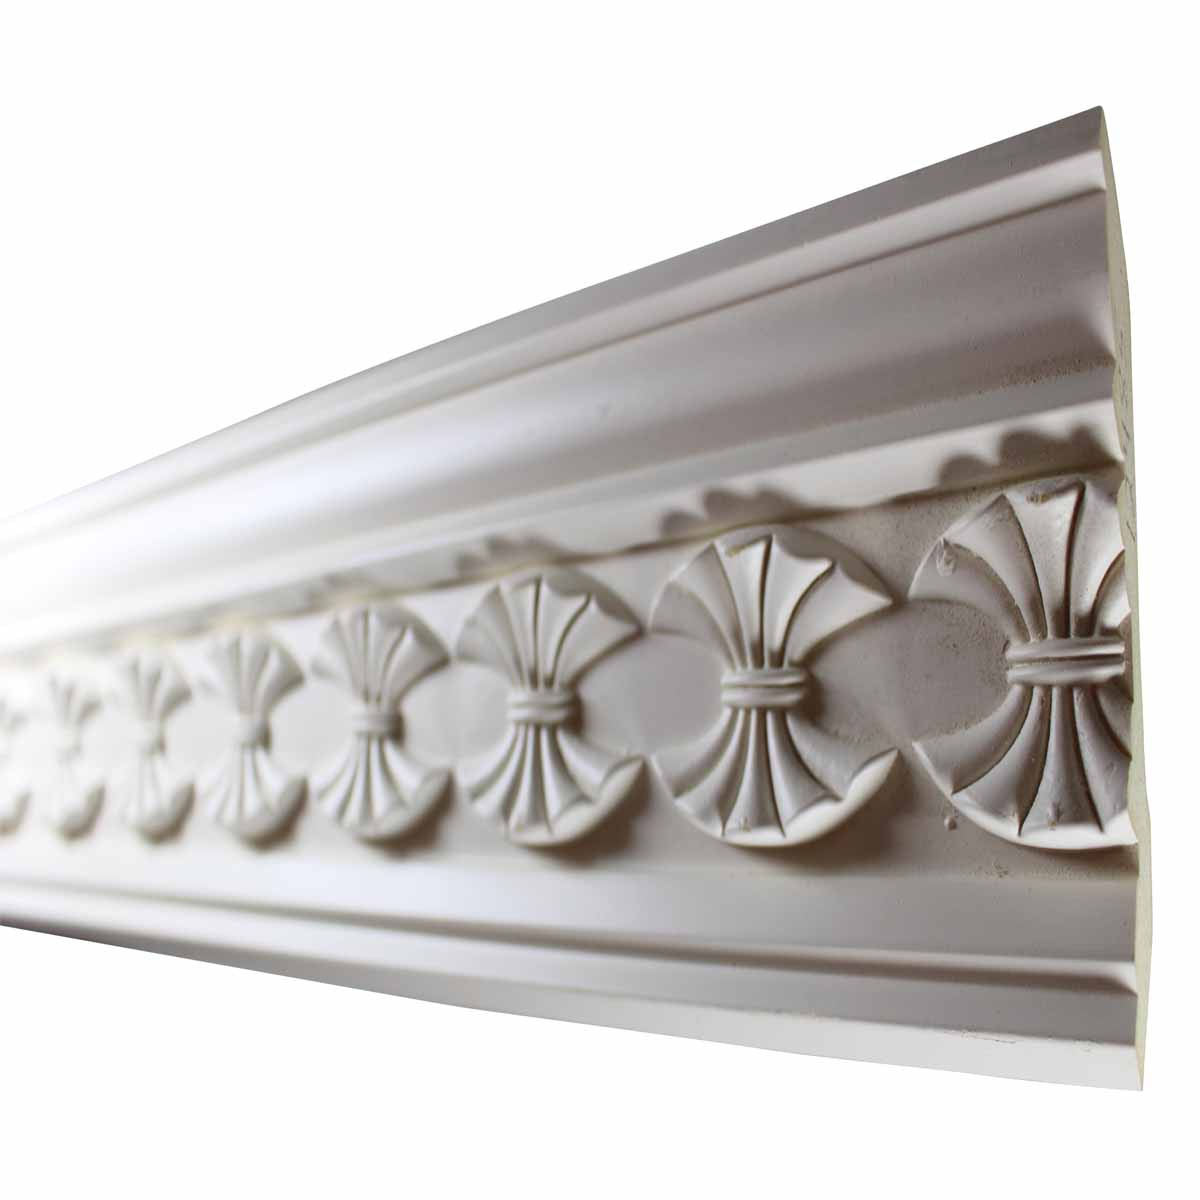 Cornice White Urethane Sample of 10992 23.5 Long Cornice Cornice Moulding Cornice Molding